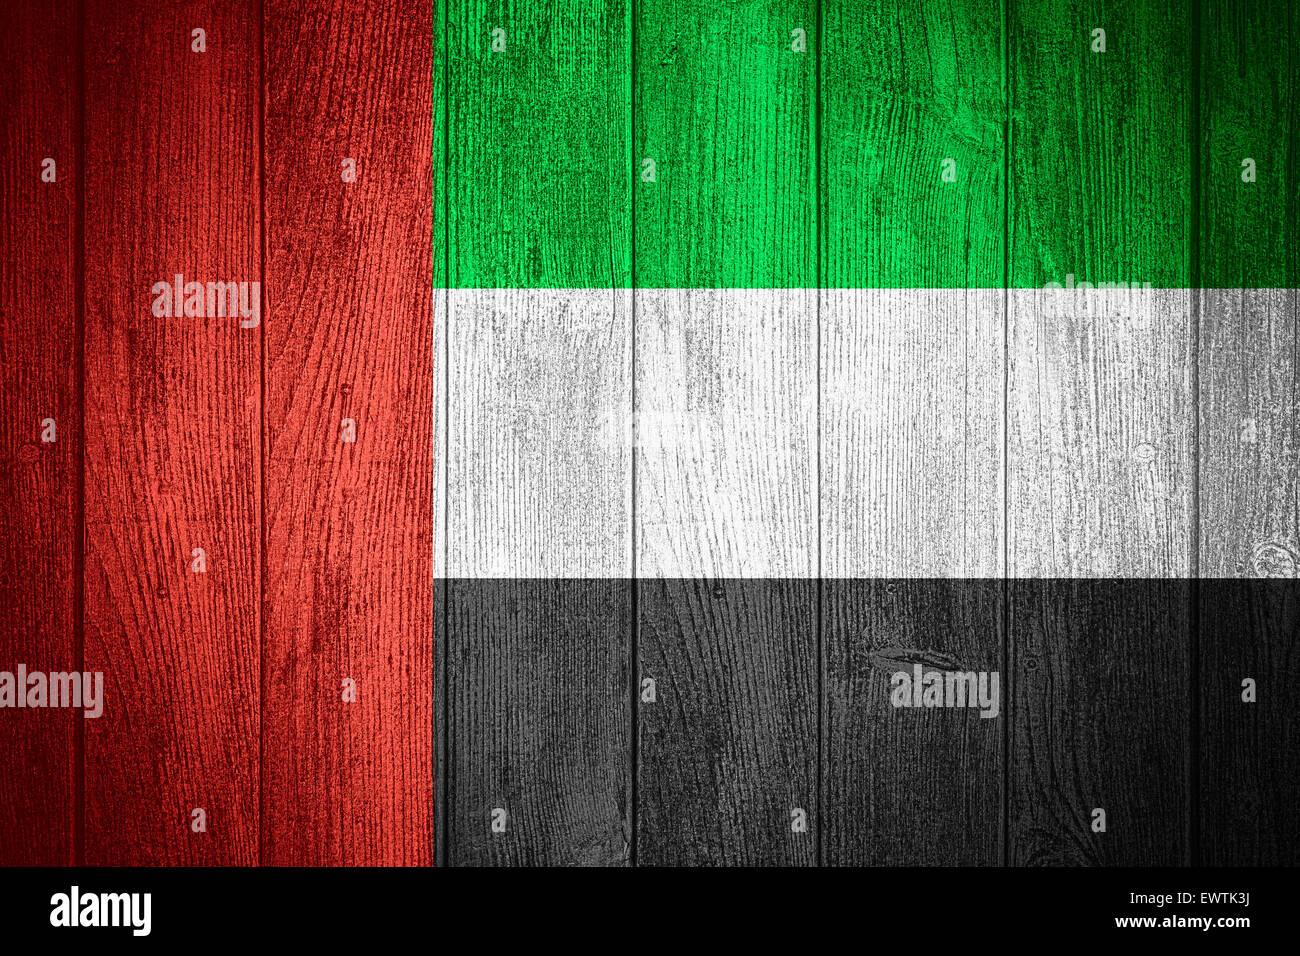 united arab emirates flag or uae banner on wooden boards background